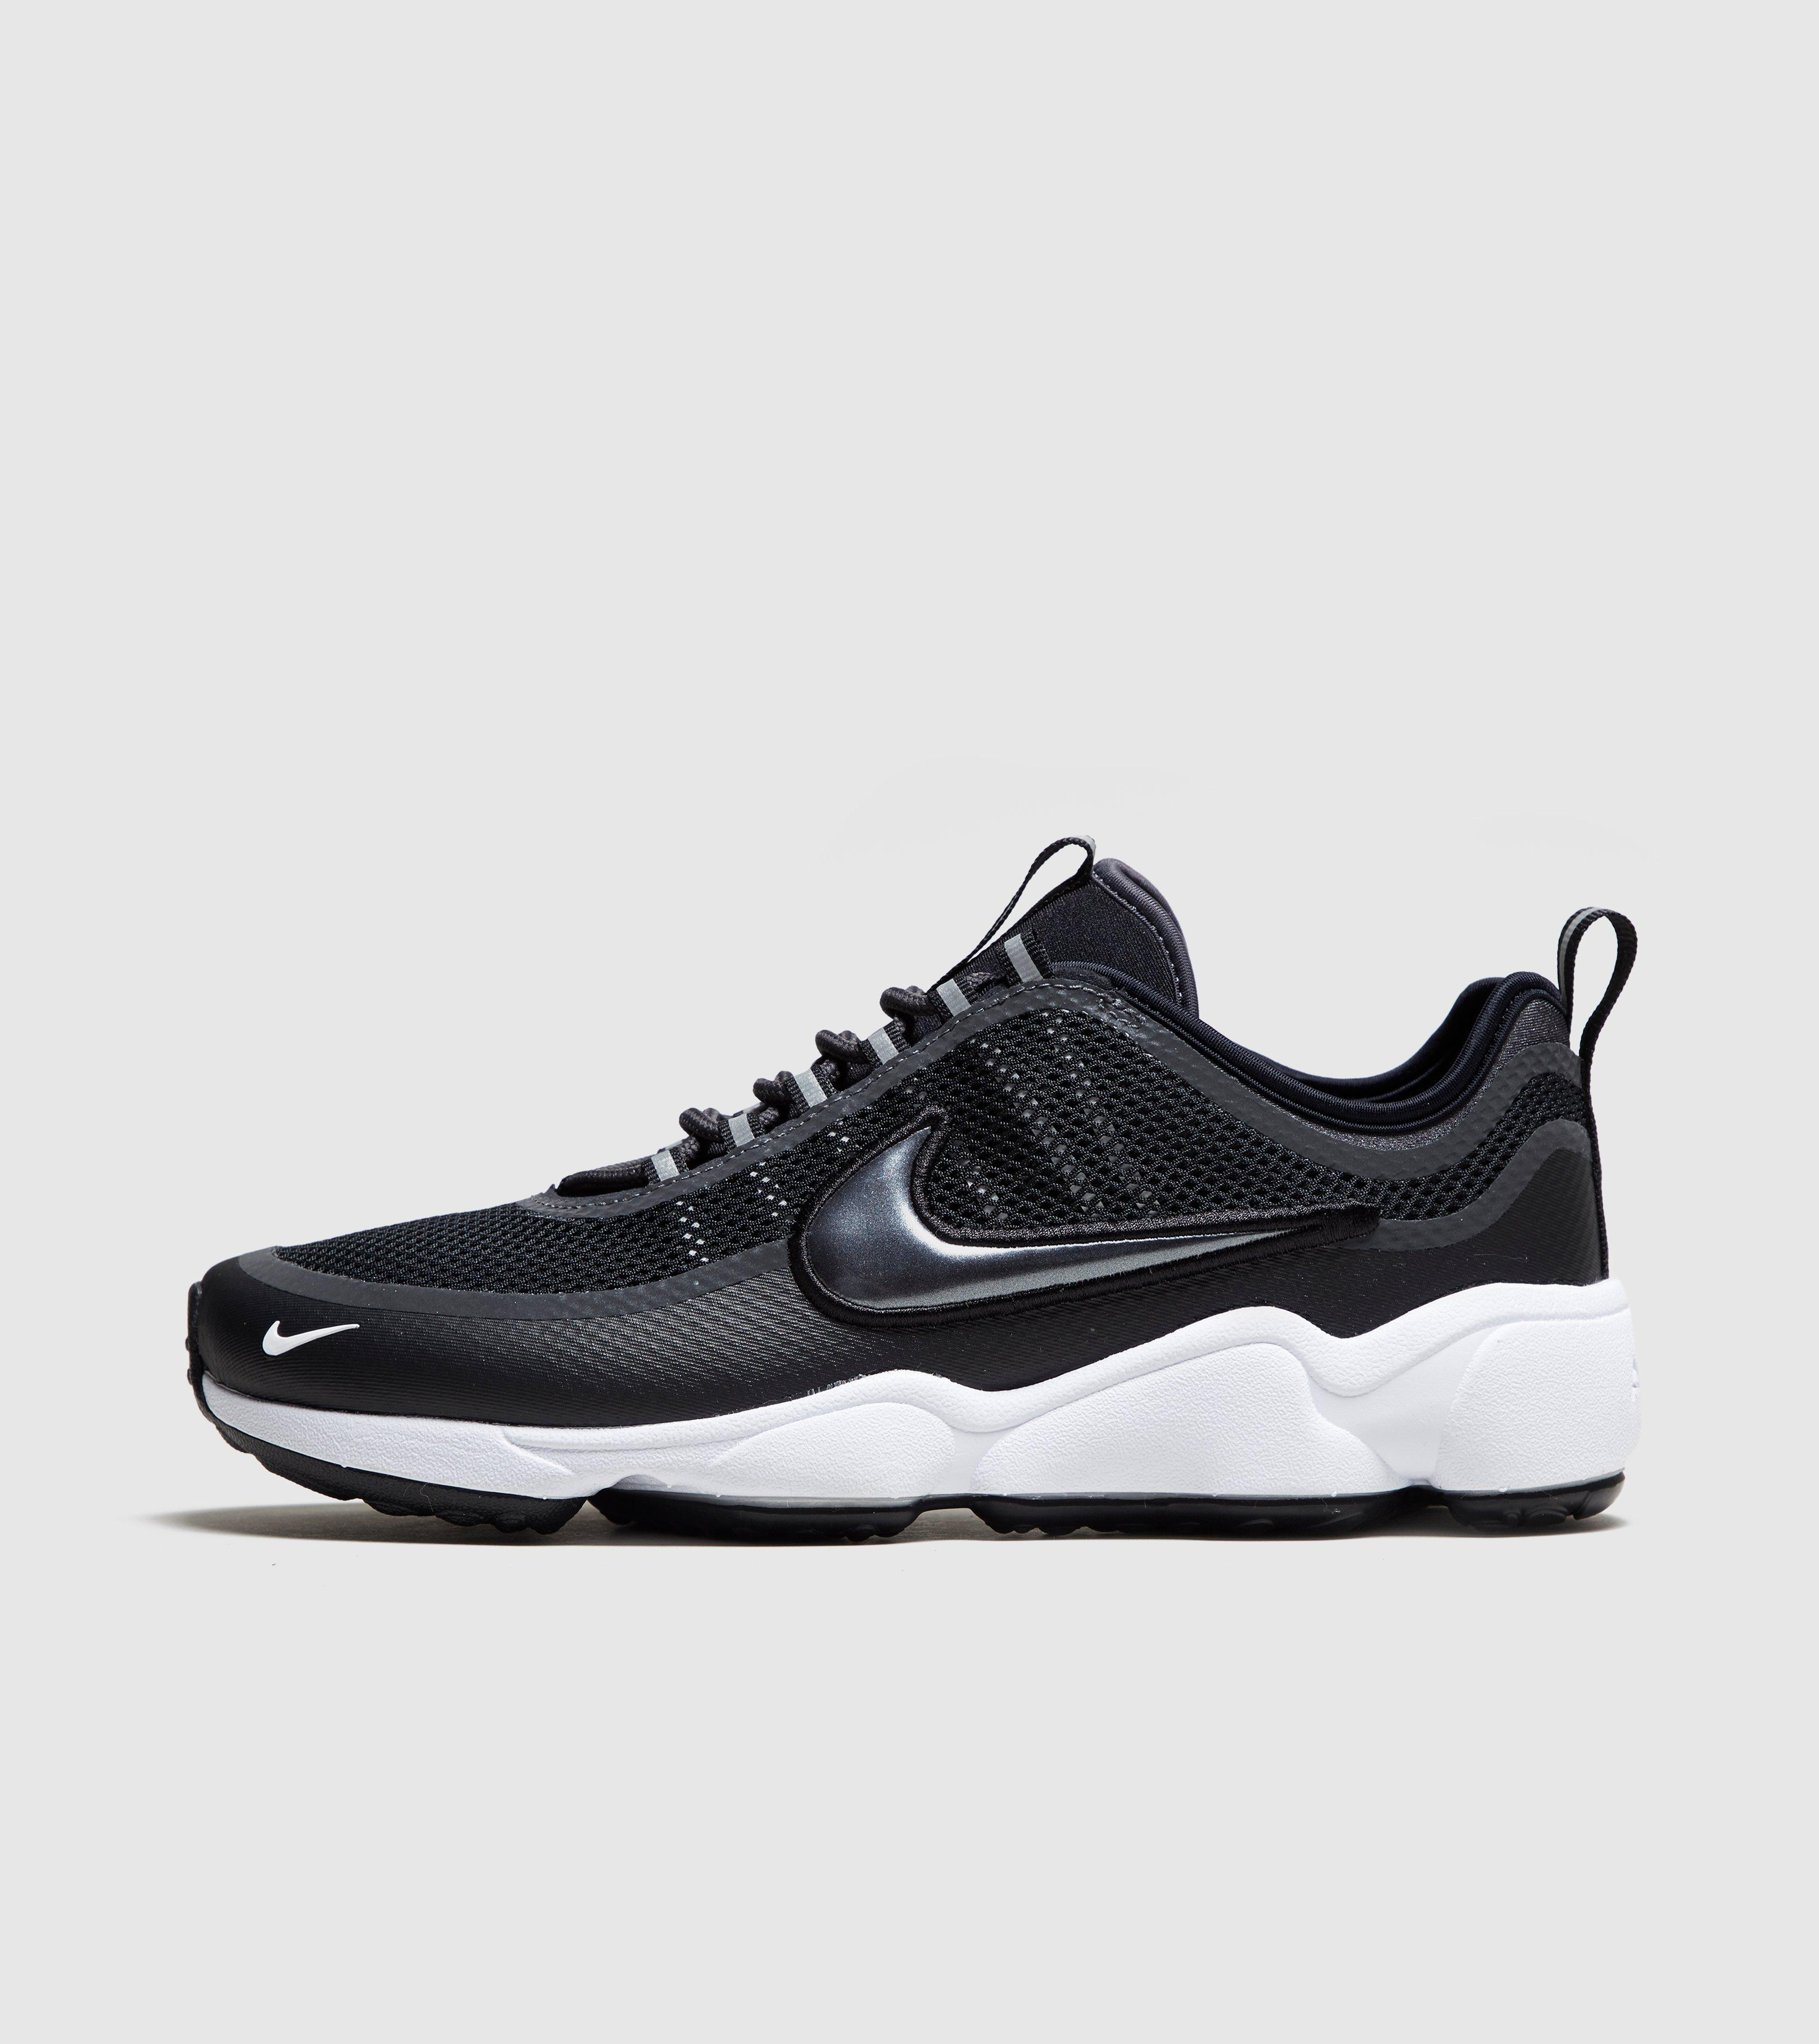 Nike Zoom Spiridon Ultra Shoes M